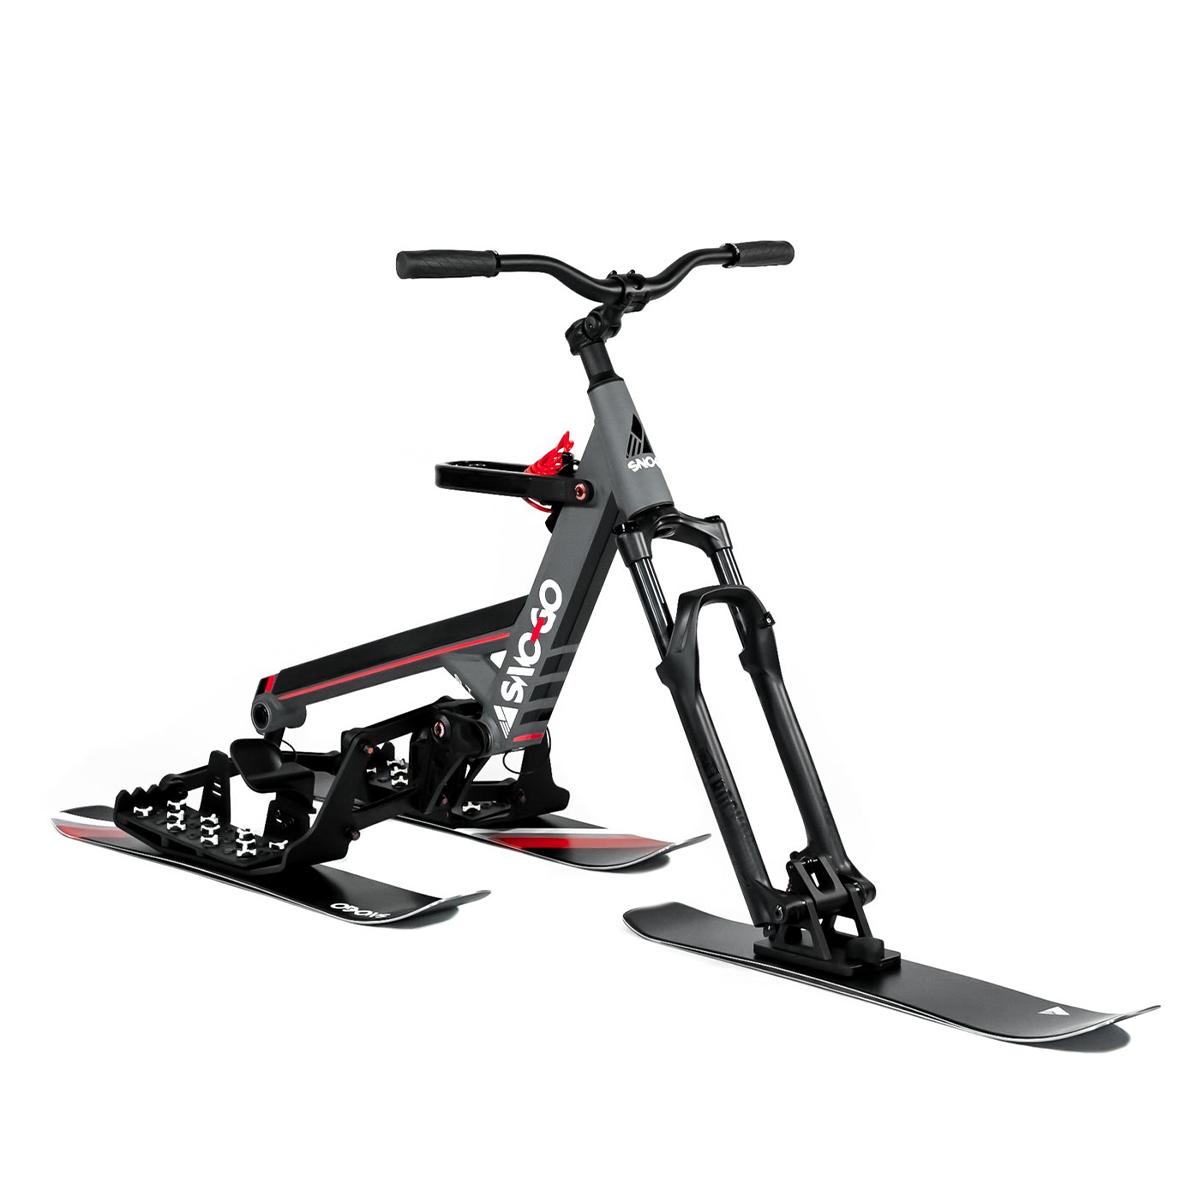 SNO-GO Powder Skis on Grey SNO-GO Bike